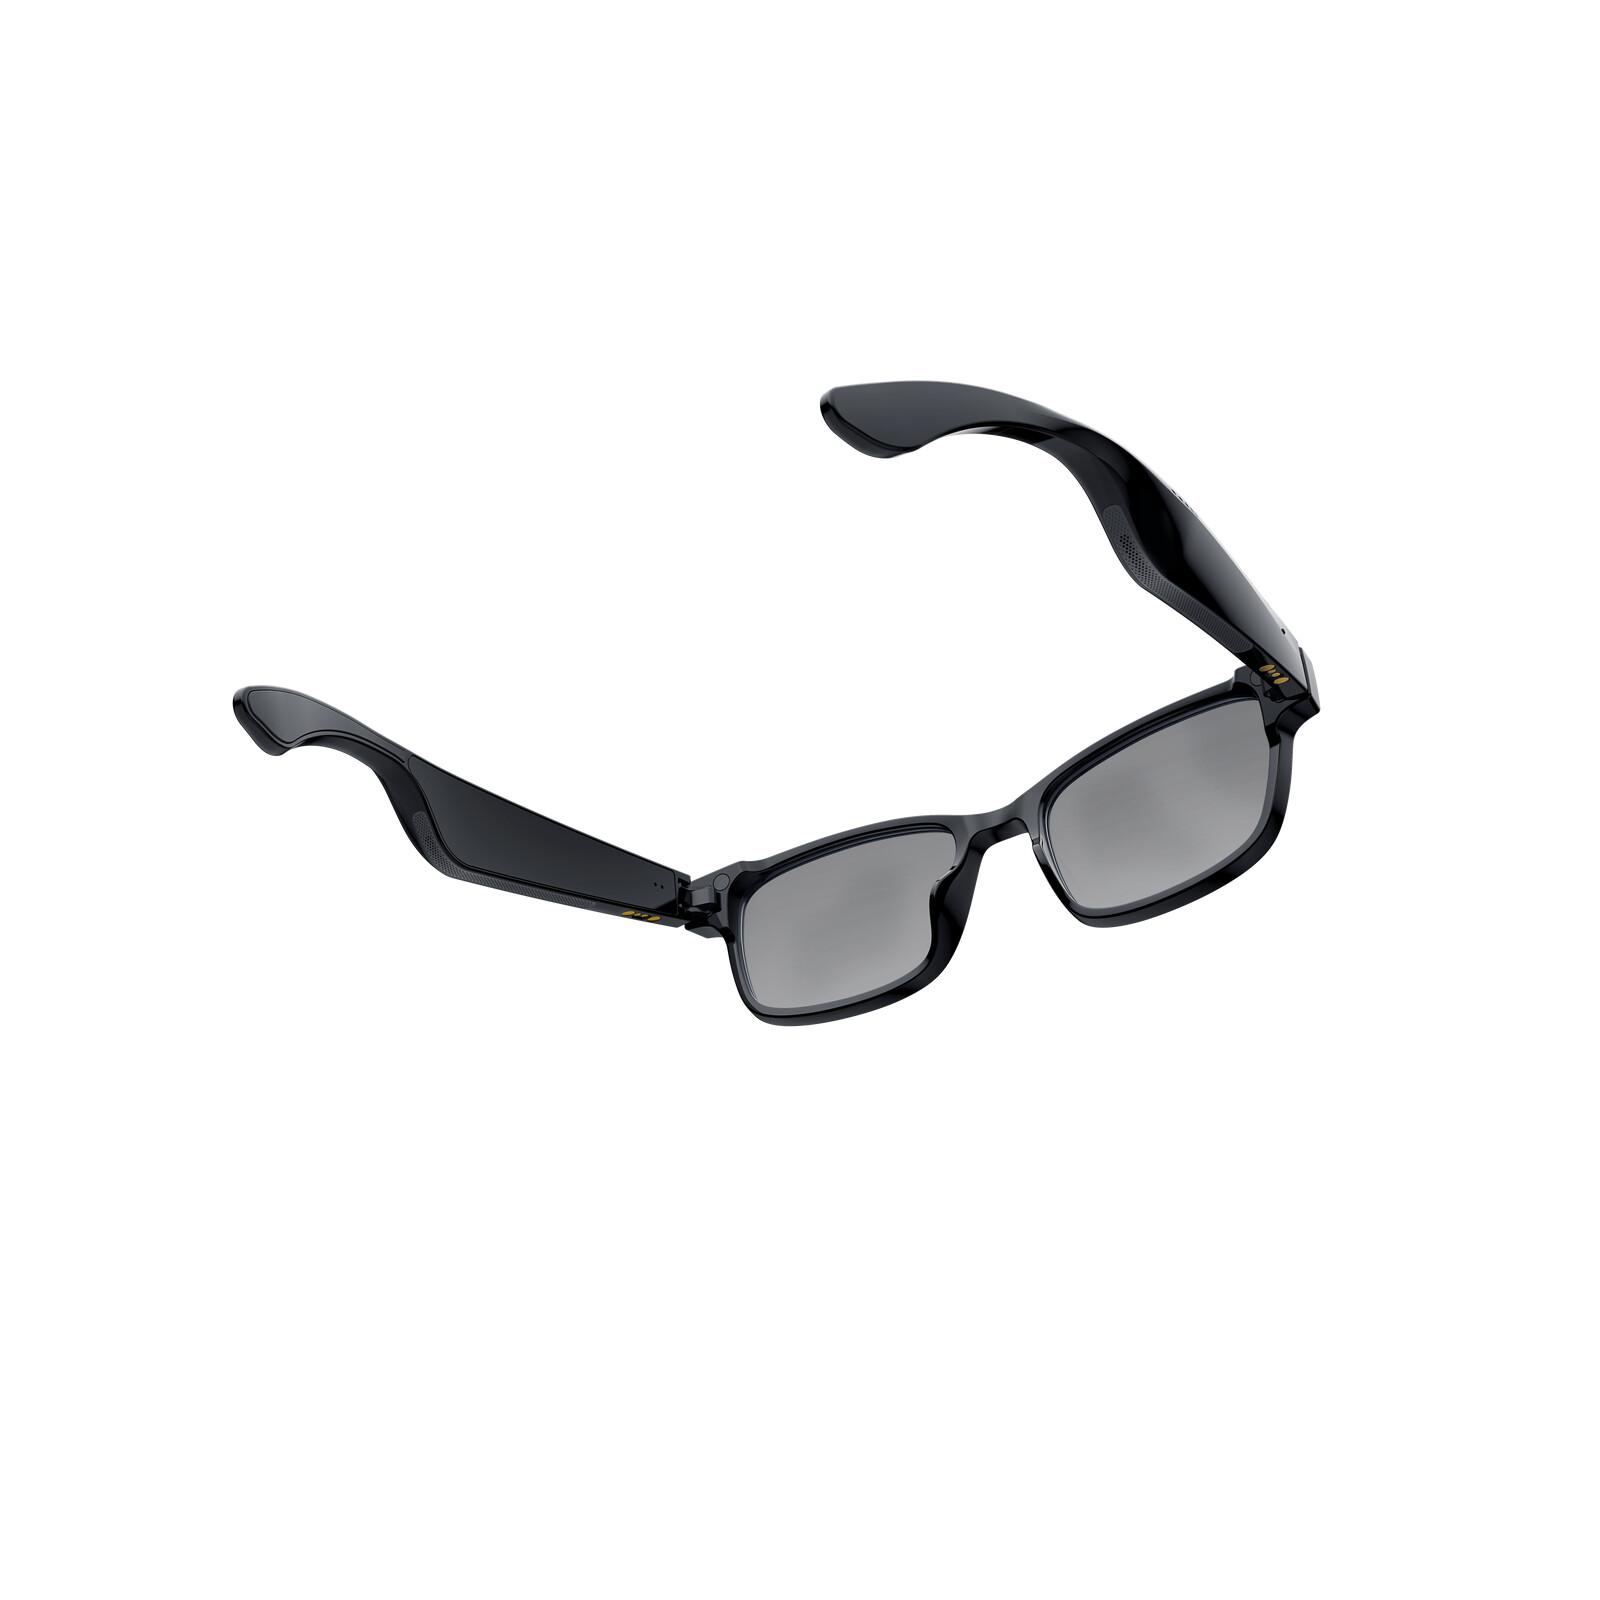 Razer Anzu - Smart Glasses (Rectangle Blue Light + Sunglass